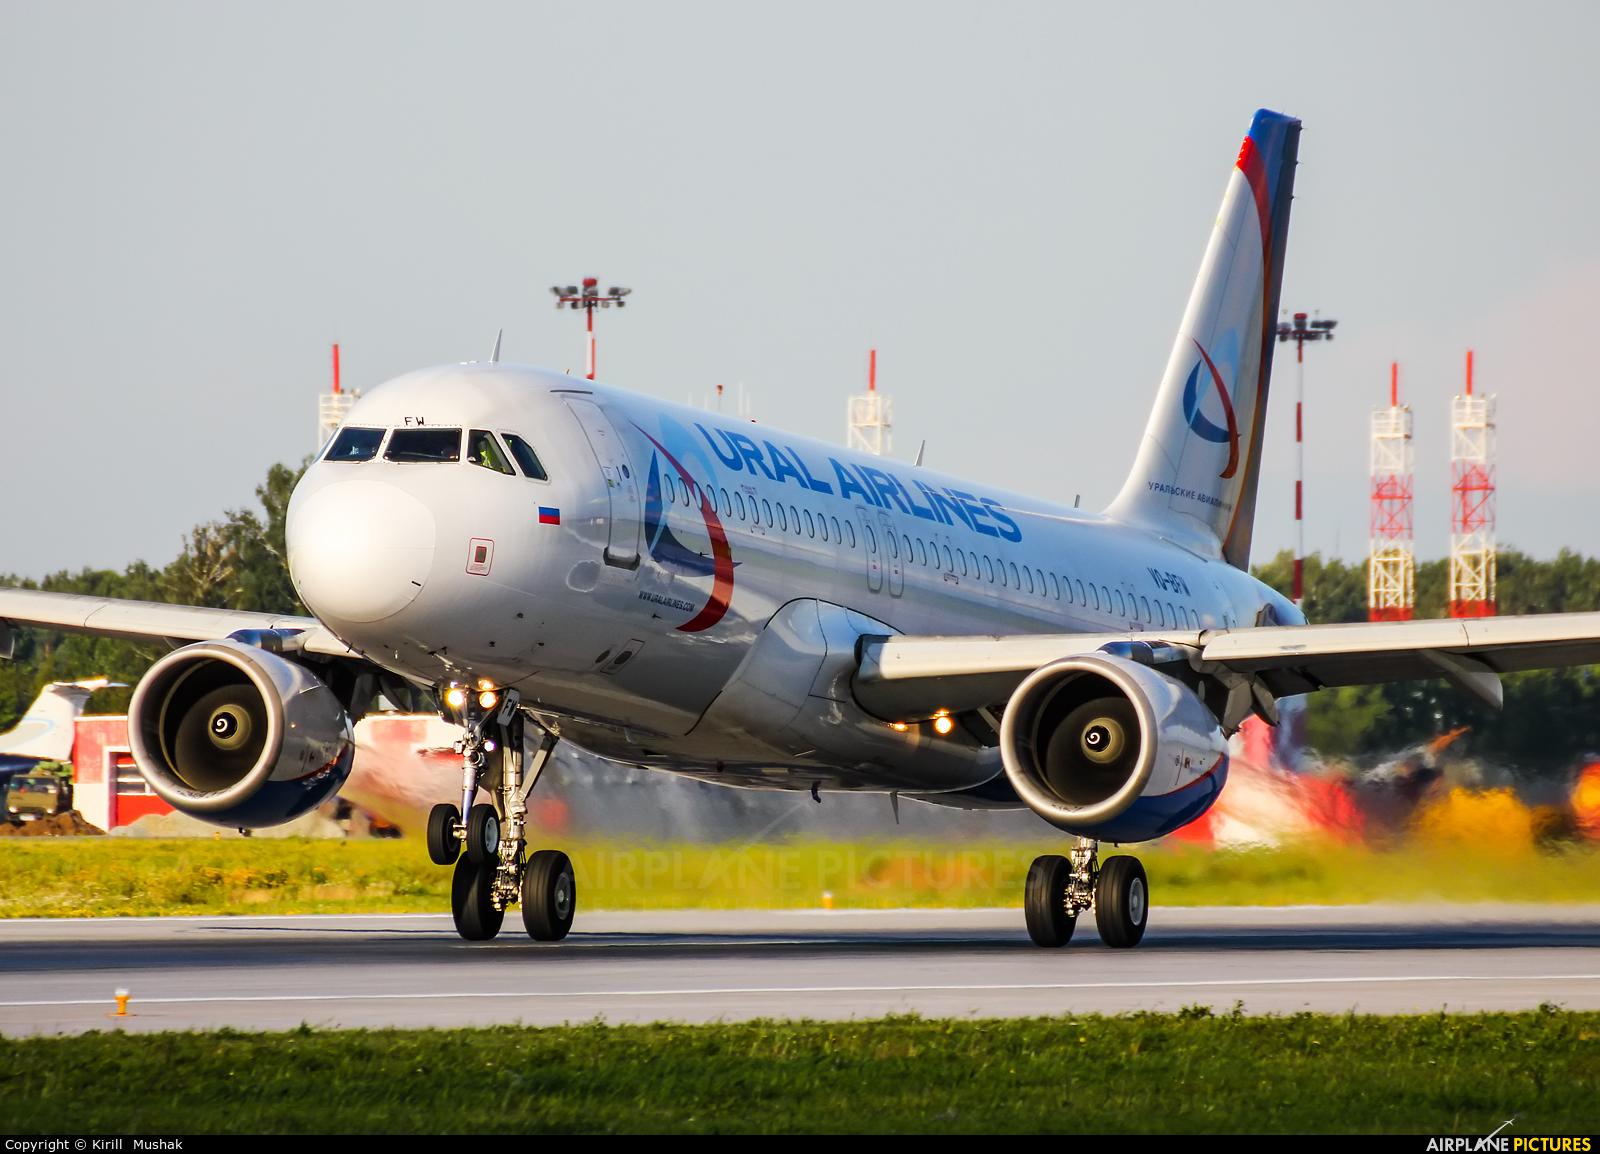 Ural Airlines VQ-BFW aircraft at Koltsovo - Ekaterinburg